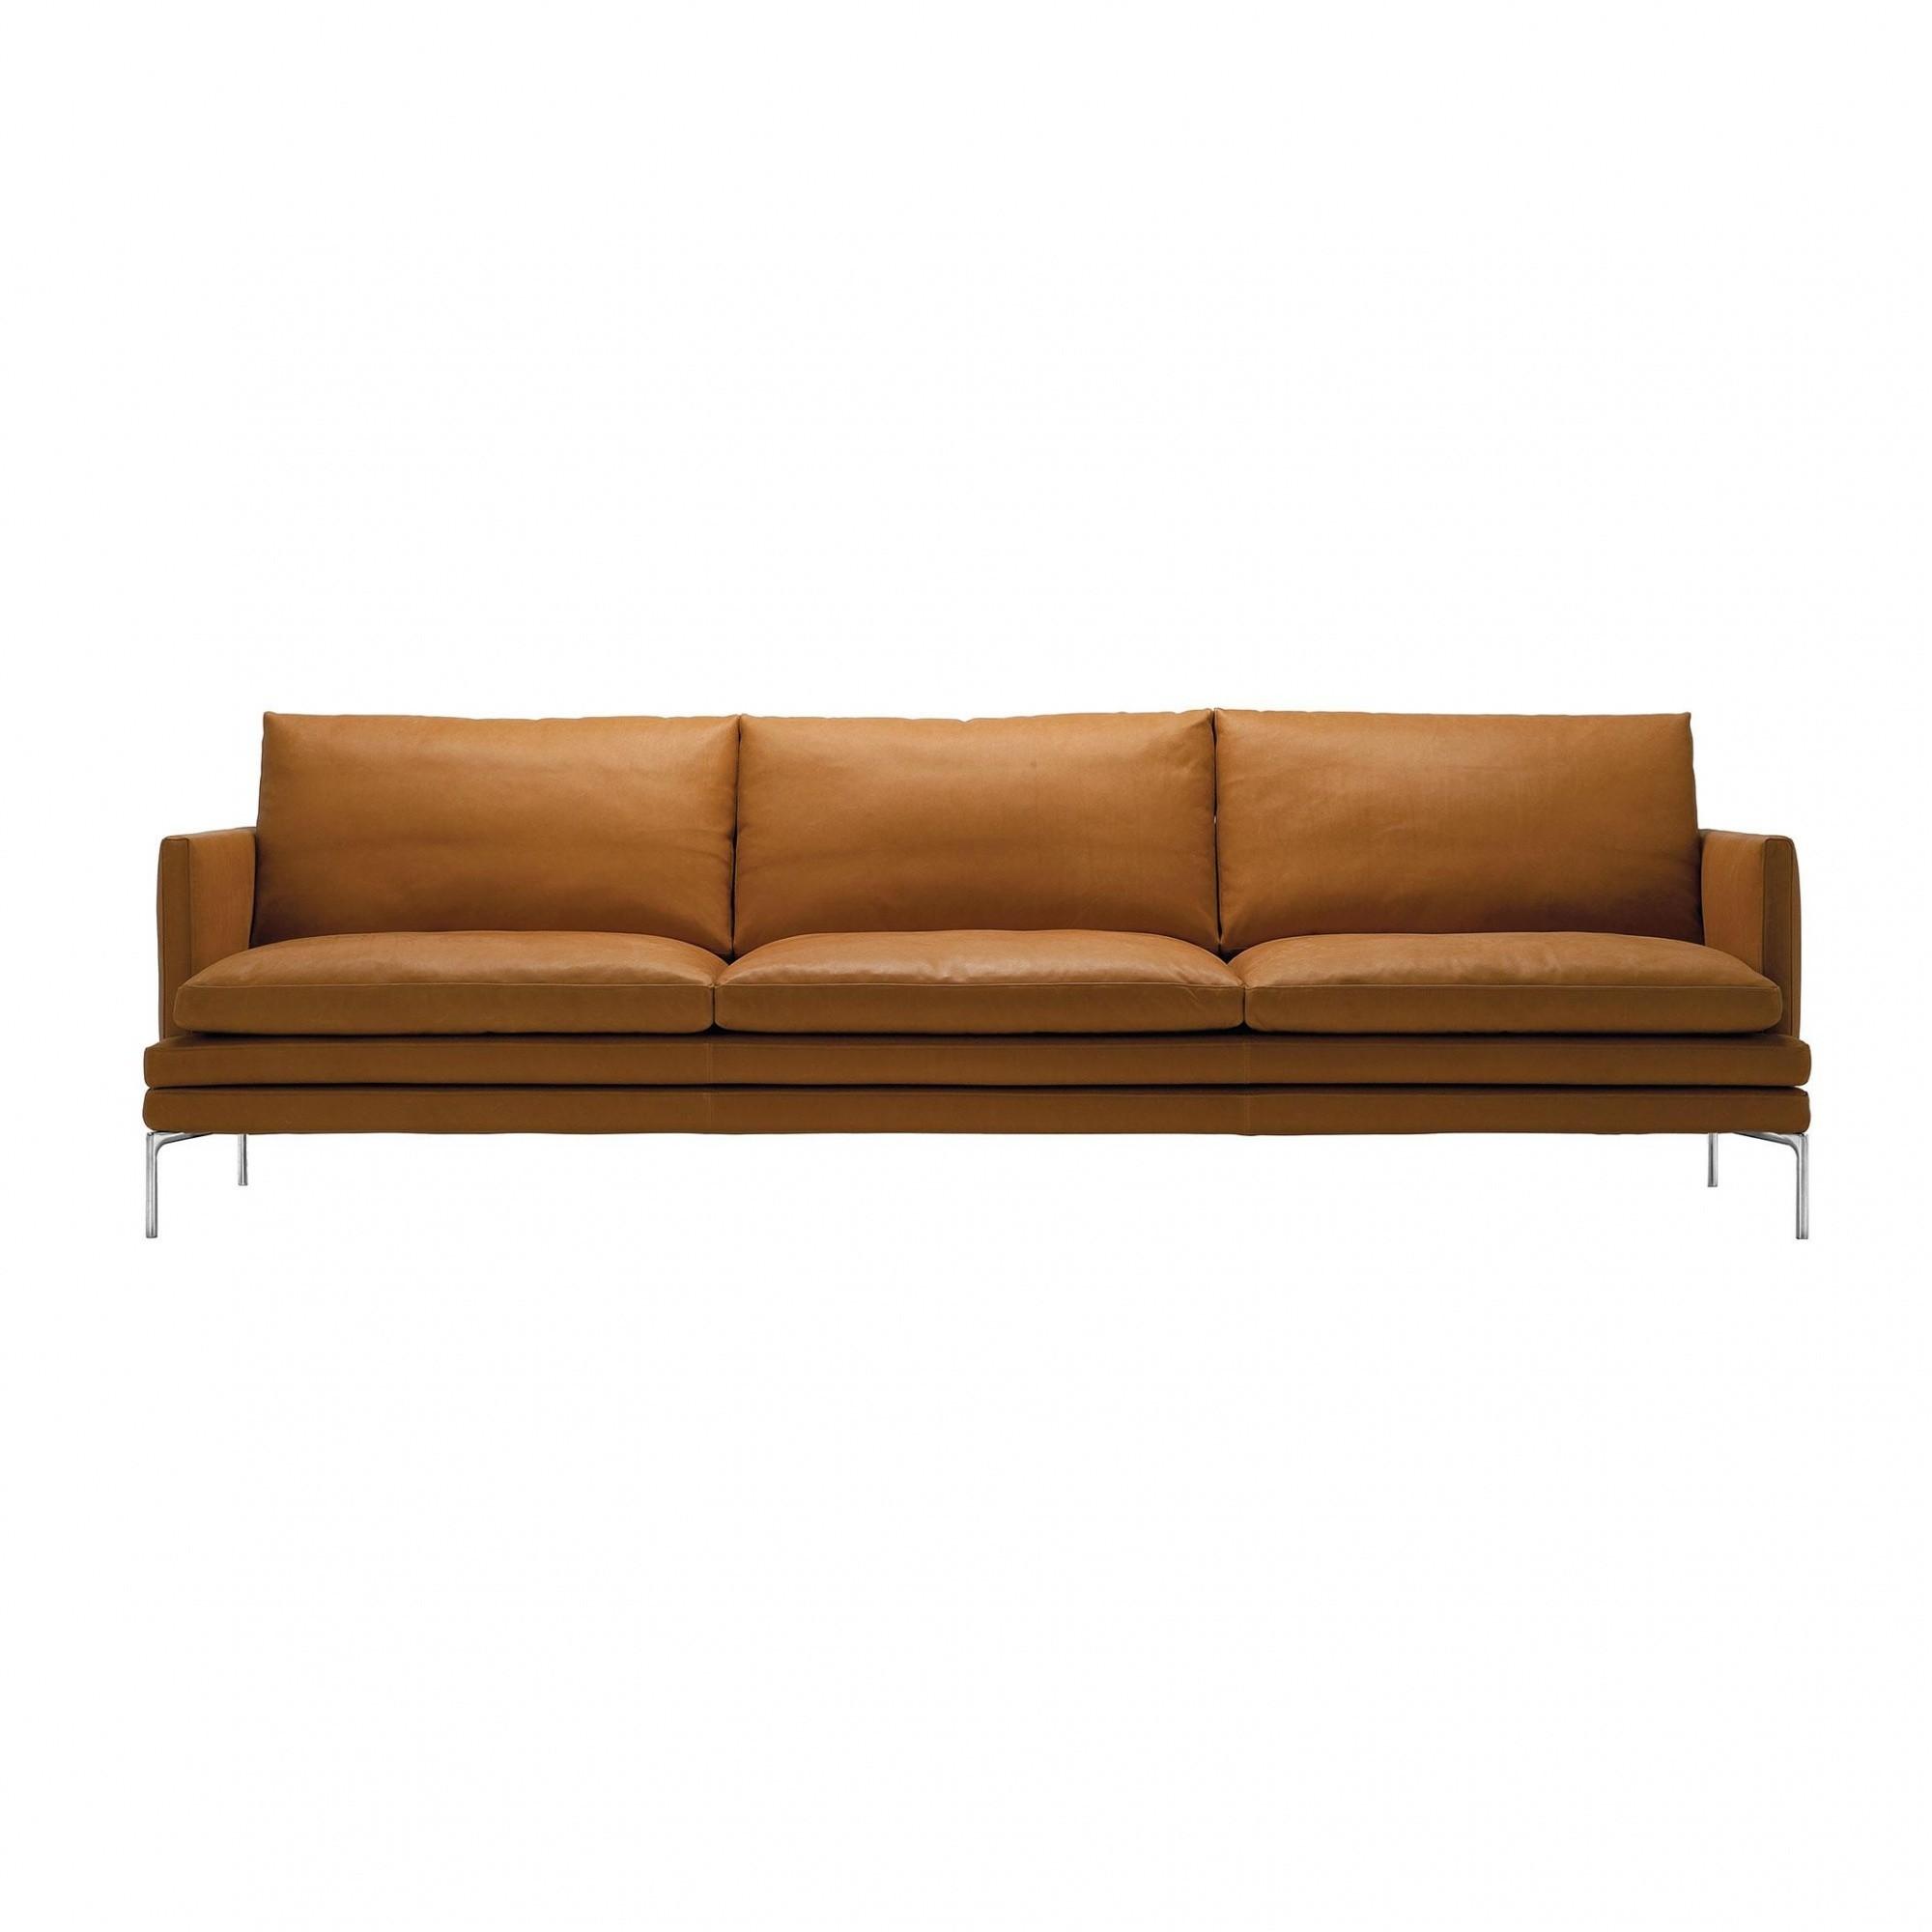 Full Size of Rahaus Sofa Couch Leder Microfaser Mit Relaxfunktion 3 Sitzer Reinigen Polyrattan Polster Baxter Büffelleder Walter Knoll Benz Große Kissen Sitzhöhe 55 Cm Sofa Rahaus Sofa